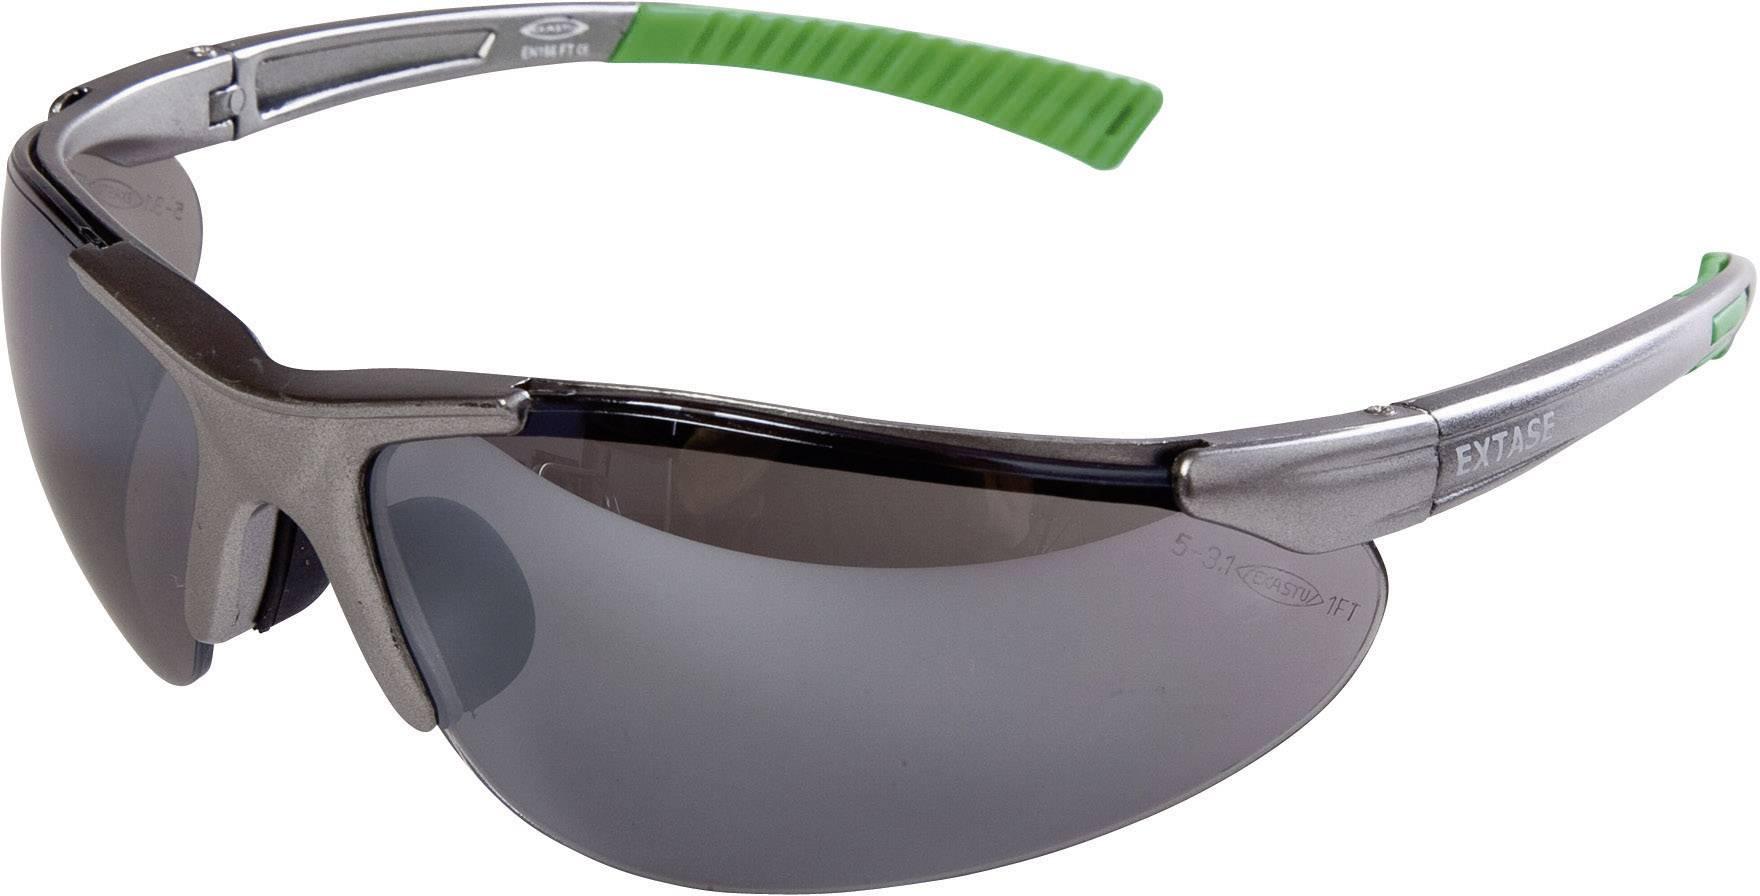 Ochranné okuliare Ekastu Sekur Safety Carina Klein Design Extase, tónované